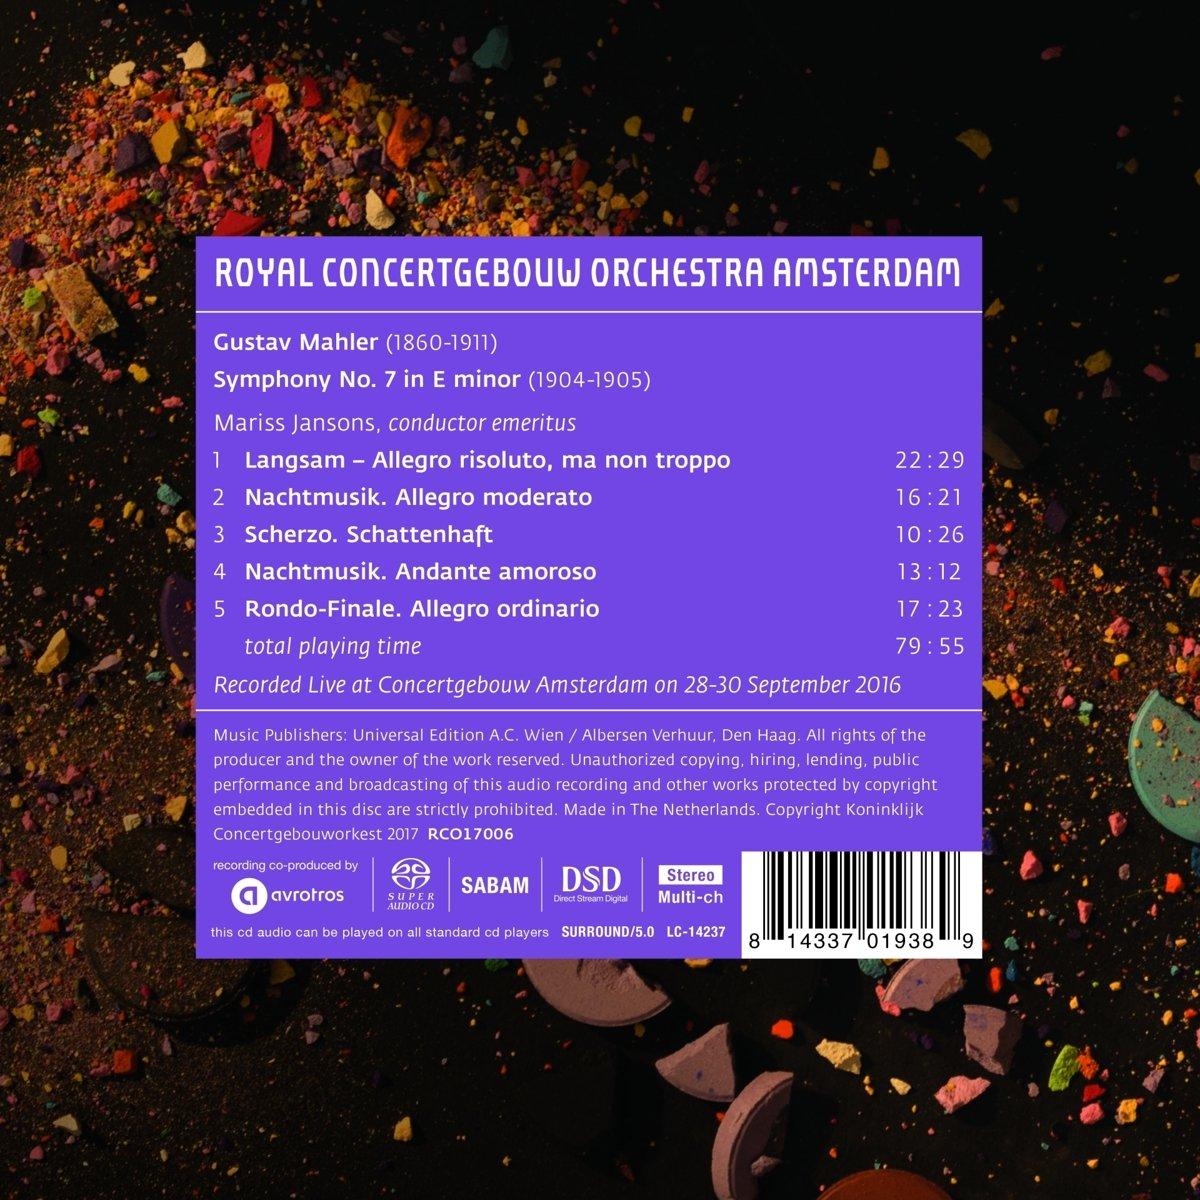 Royal Concertgebouw Orchestra, Gustav Mahler, Mariss Jansons